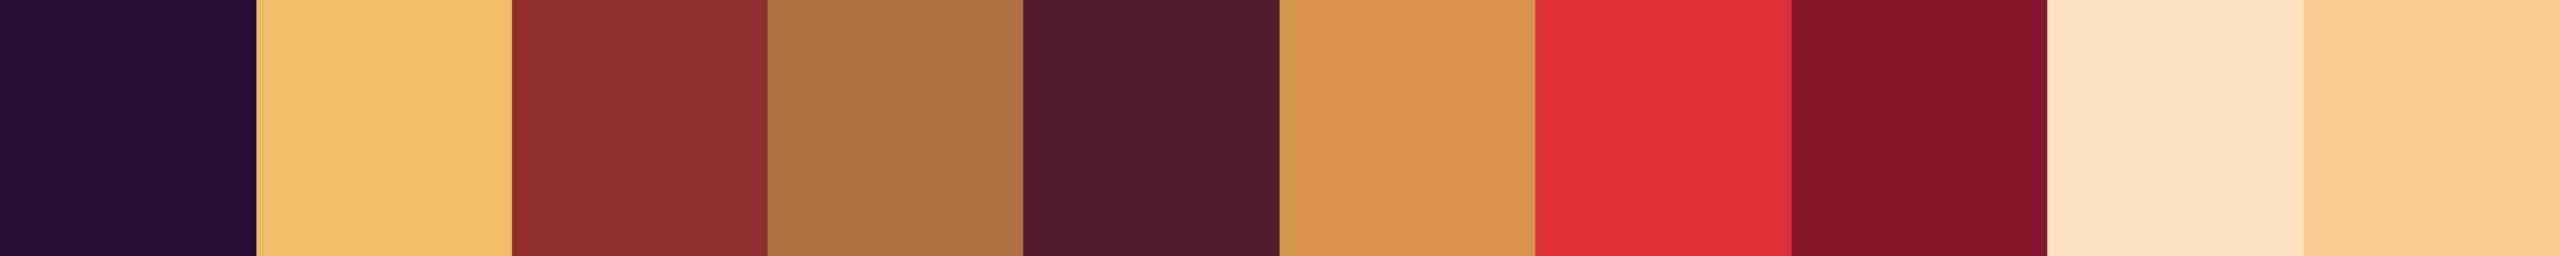 769 Pockonia Color Palette